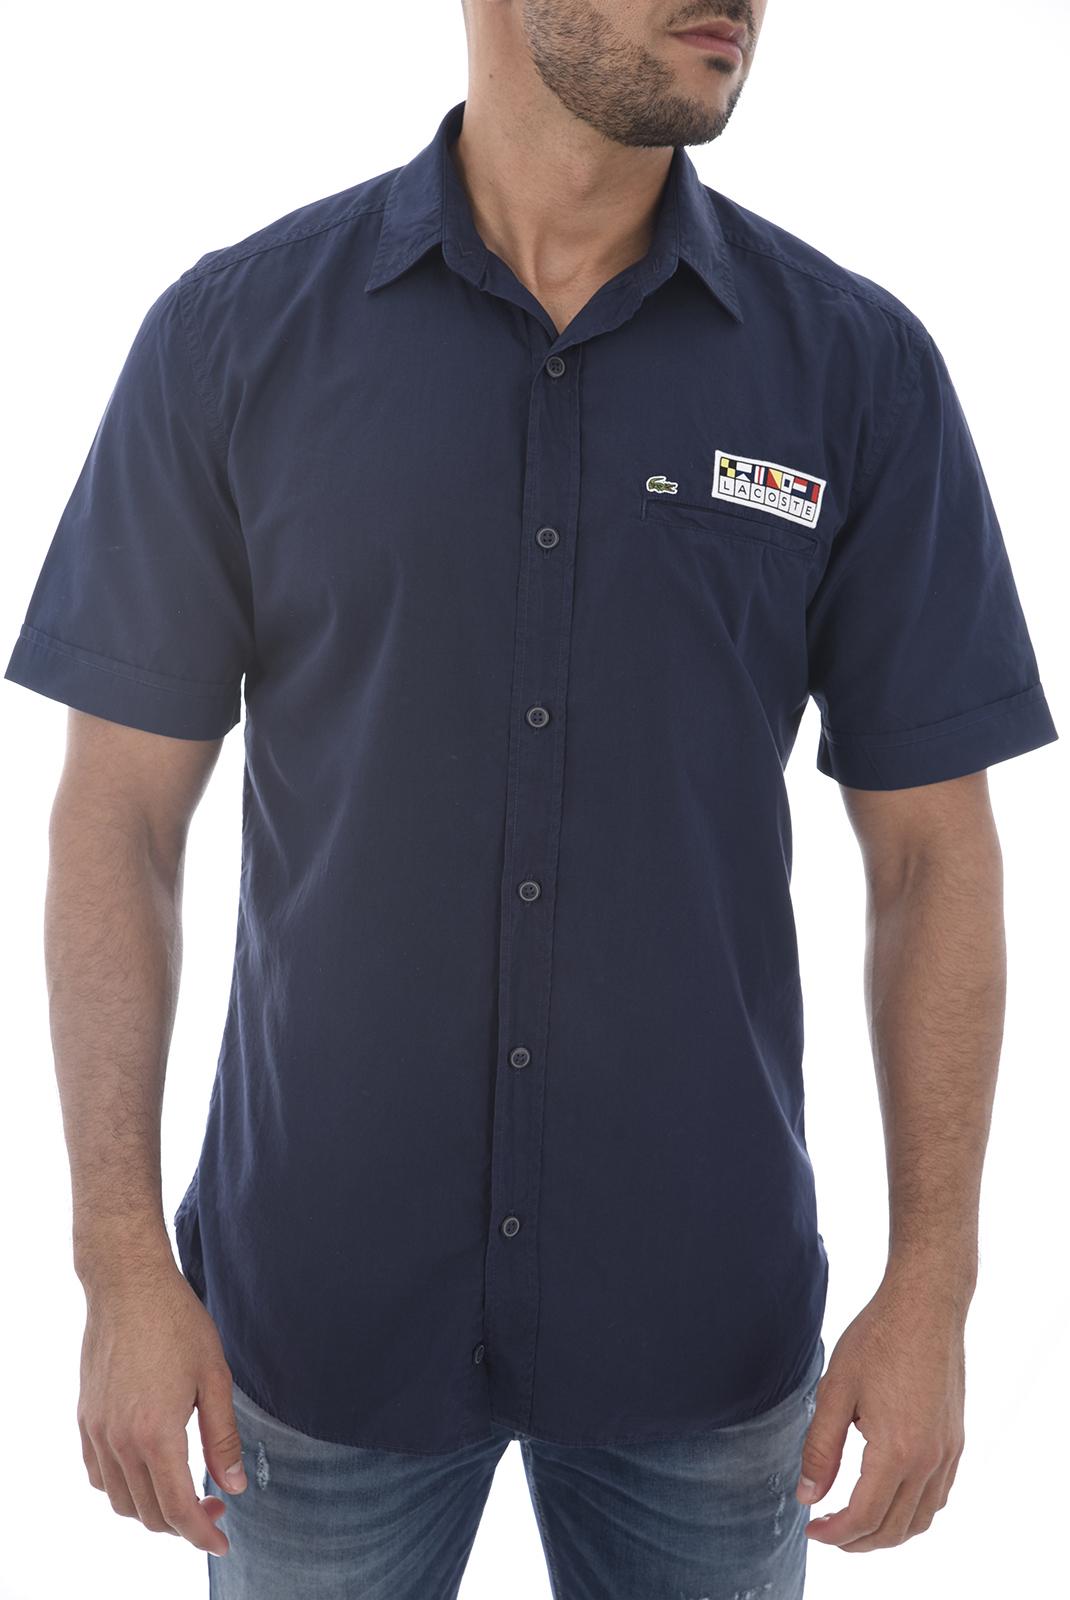 Chemises manches courtes  Lacoste CH6115 166 NAVY BLUE